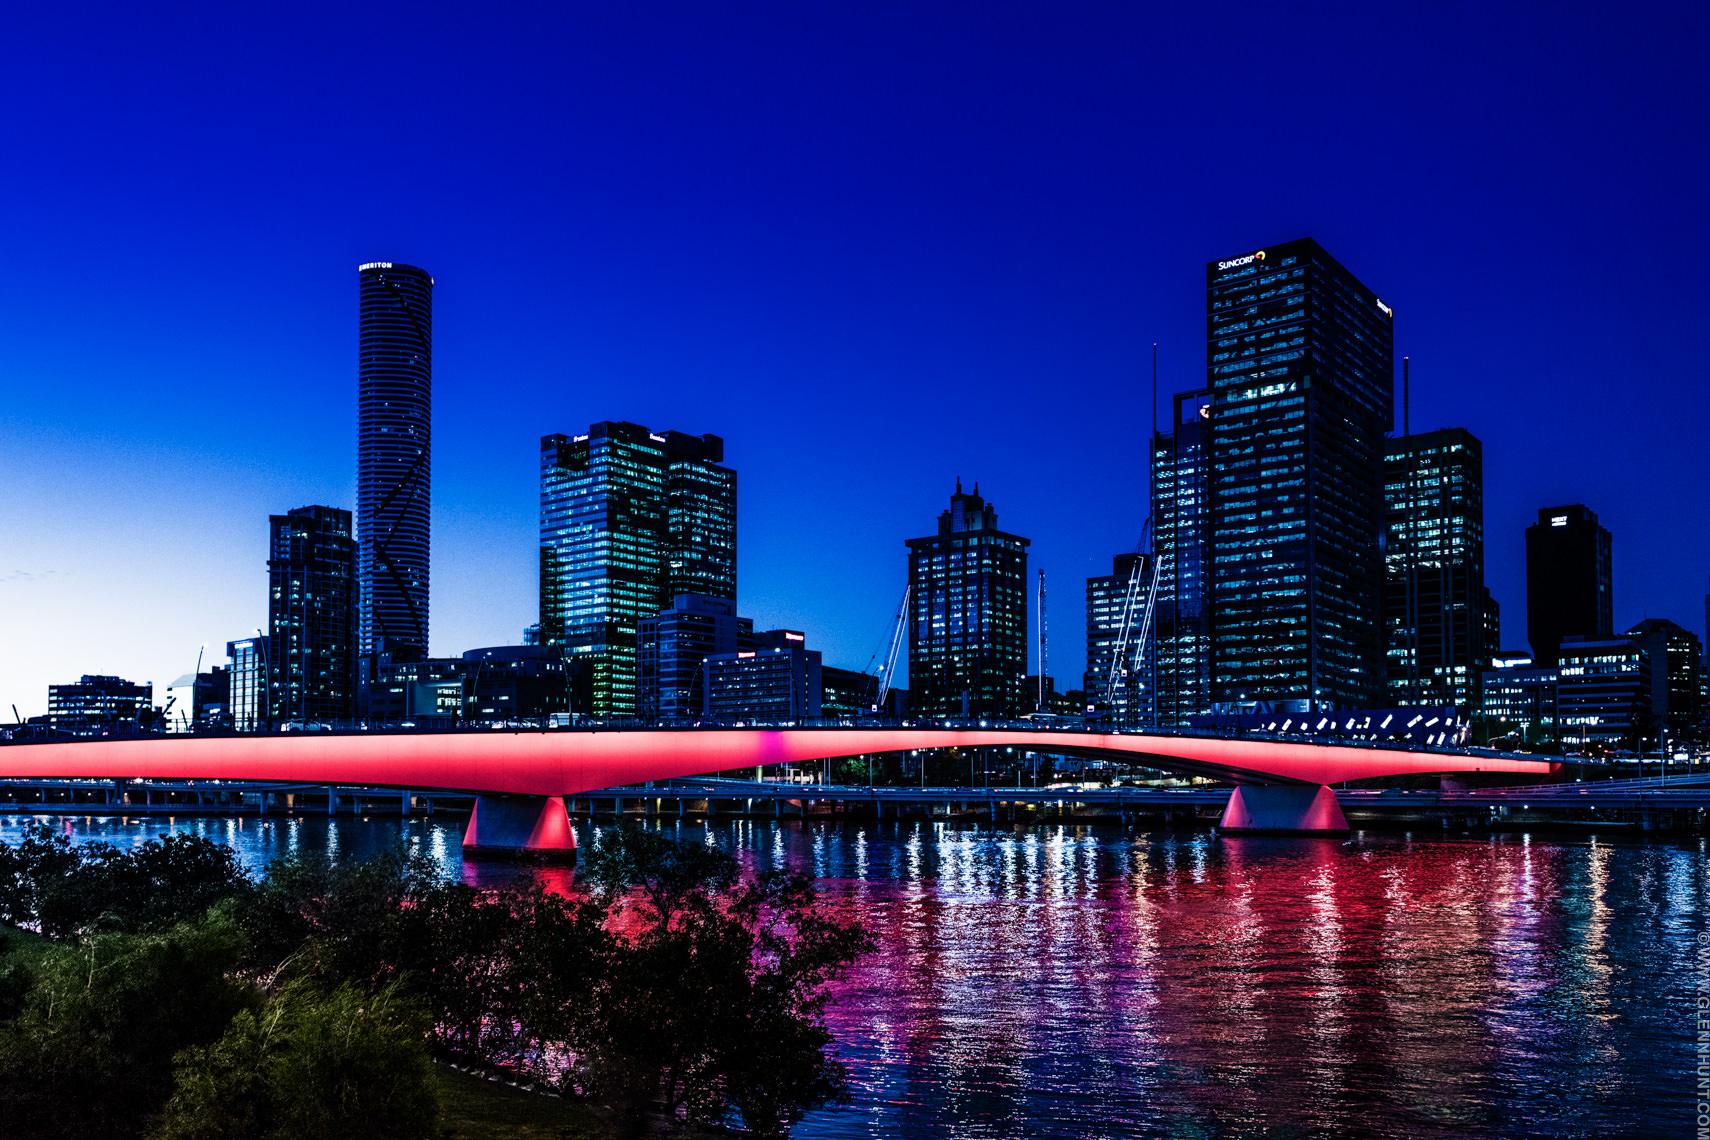 Brisbane Photographer Glenn Hunt